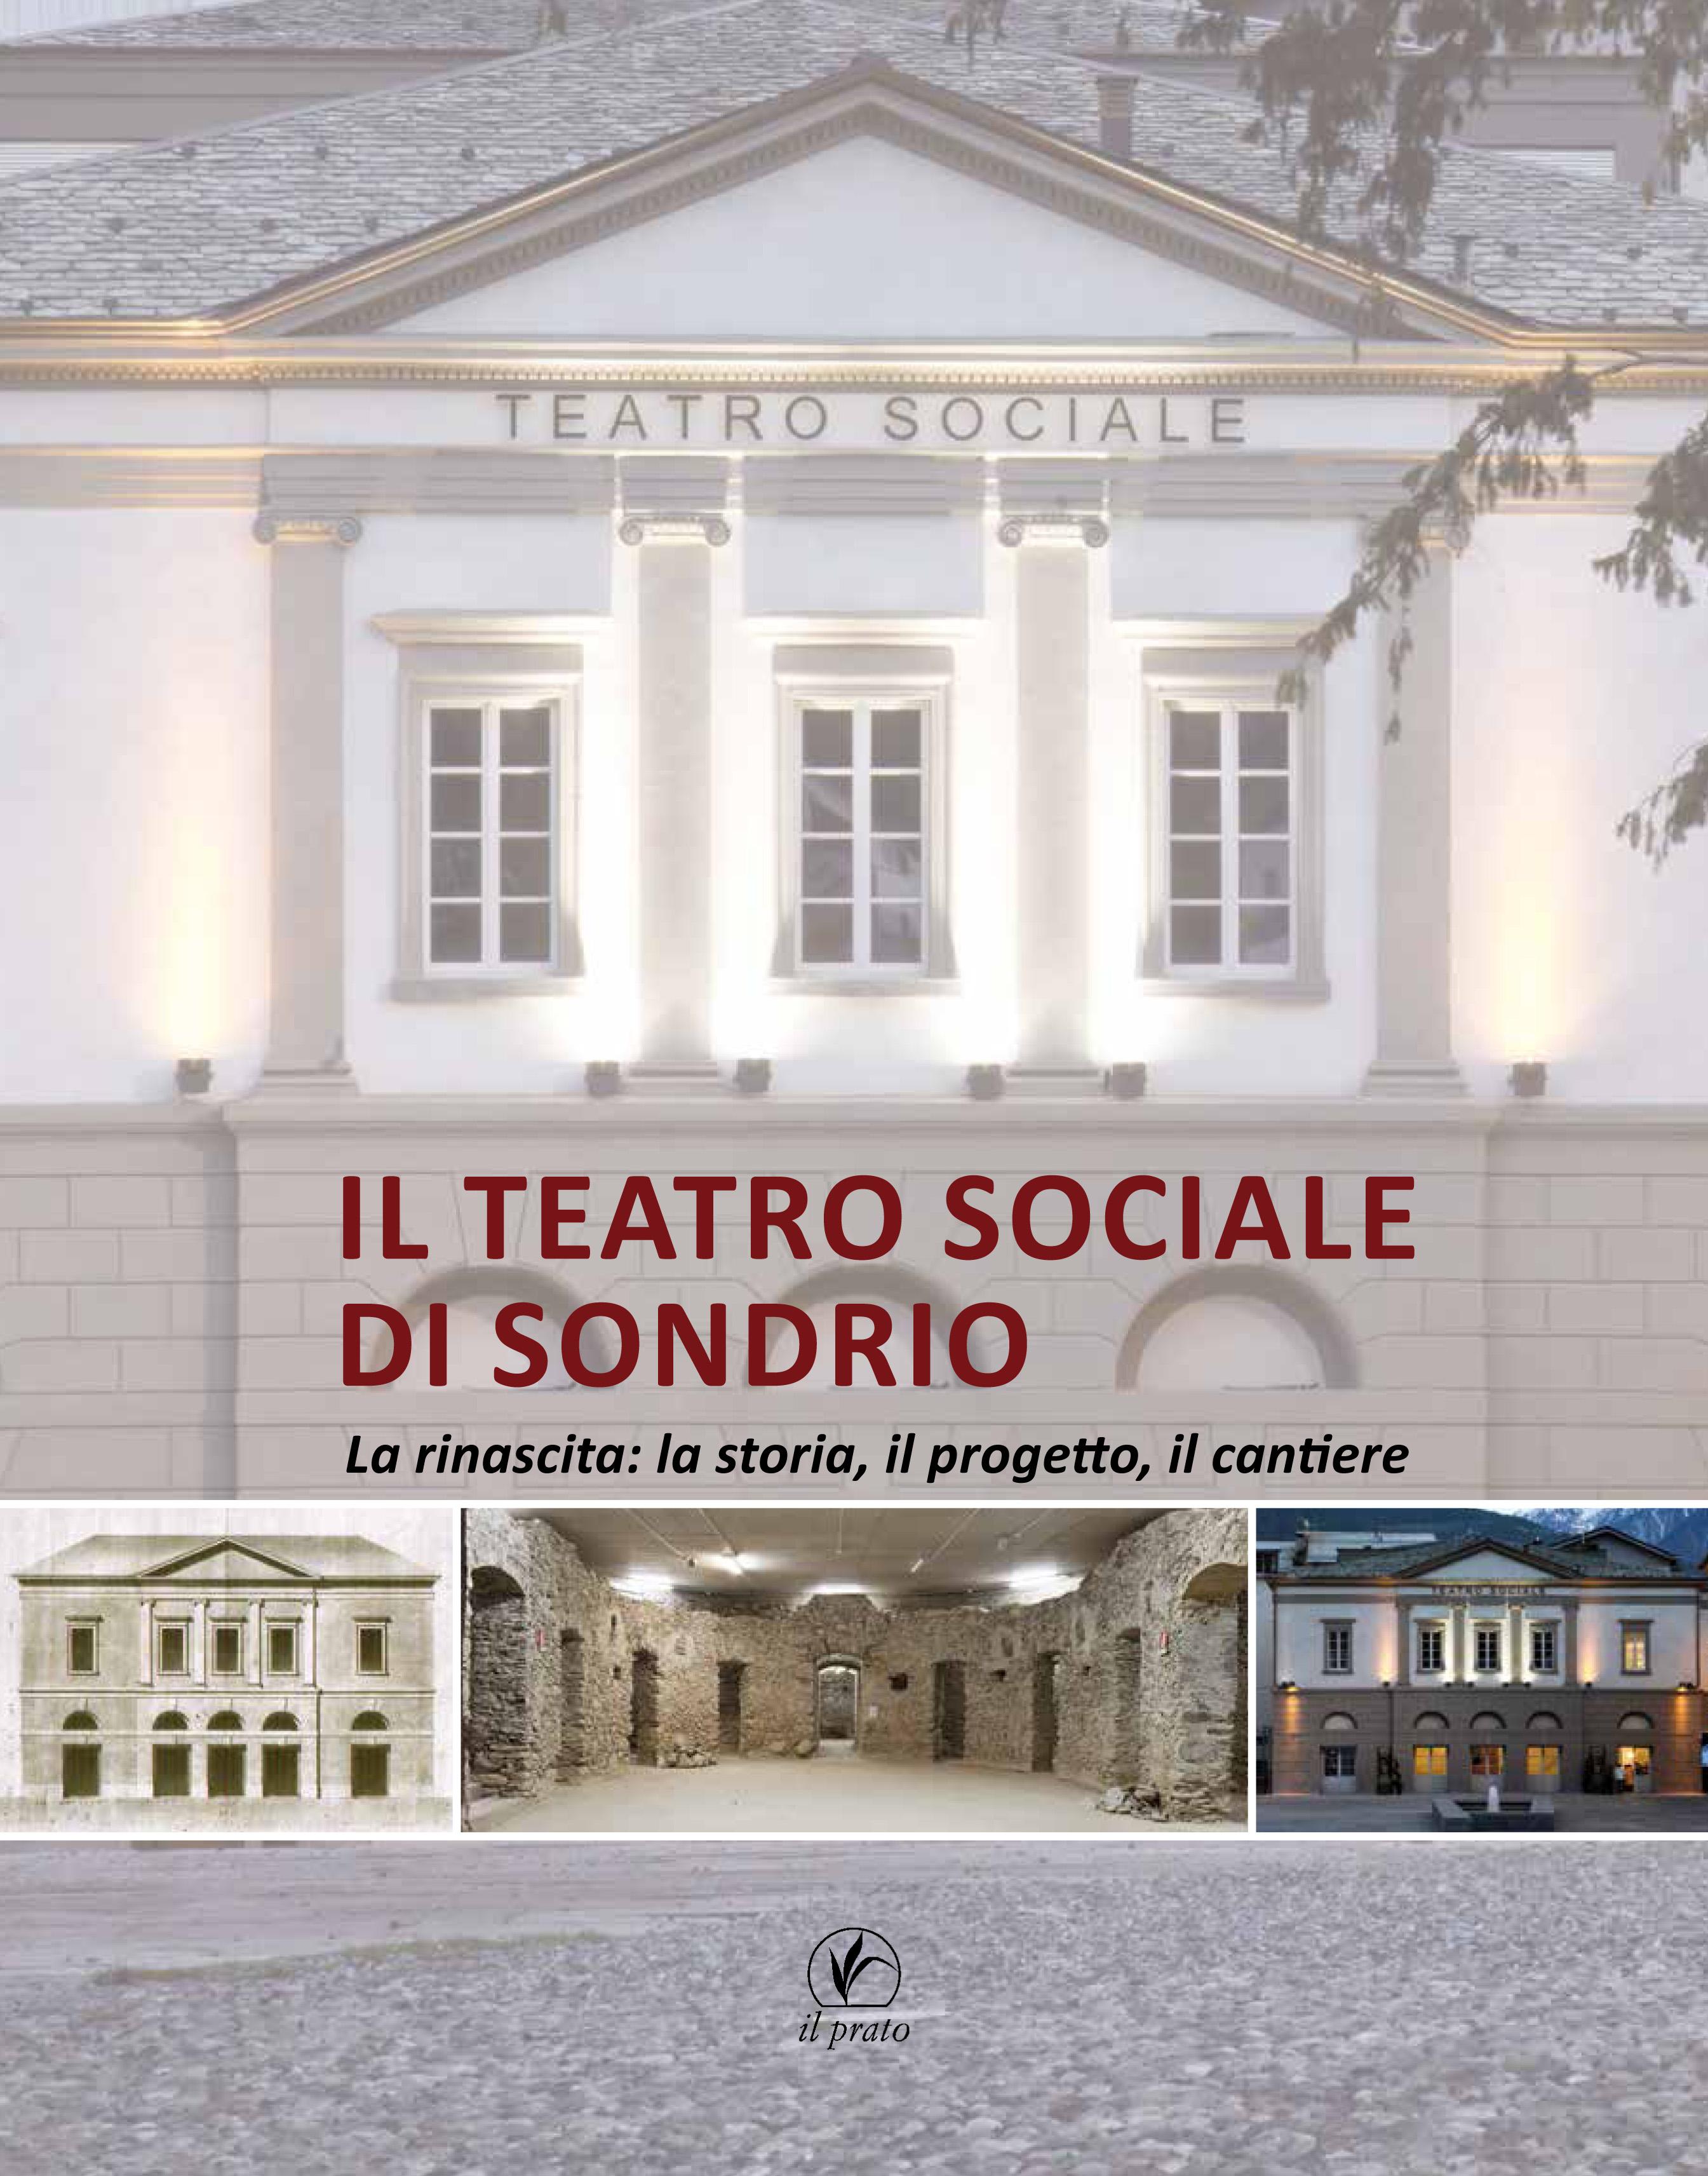 Teatro Sociale di Sondrio